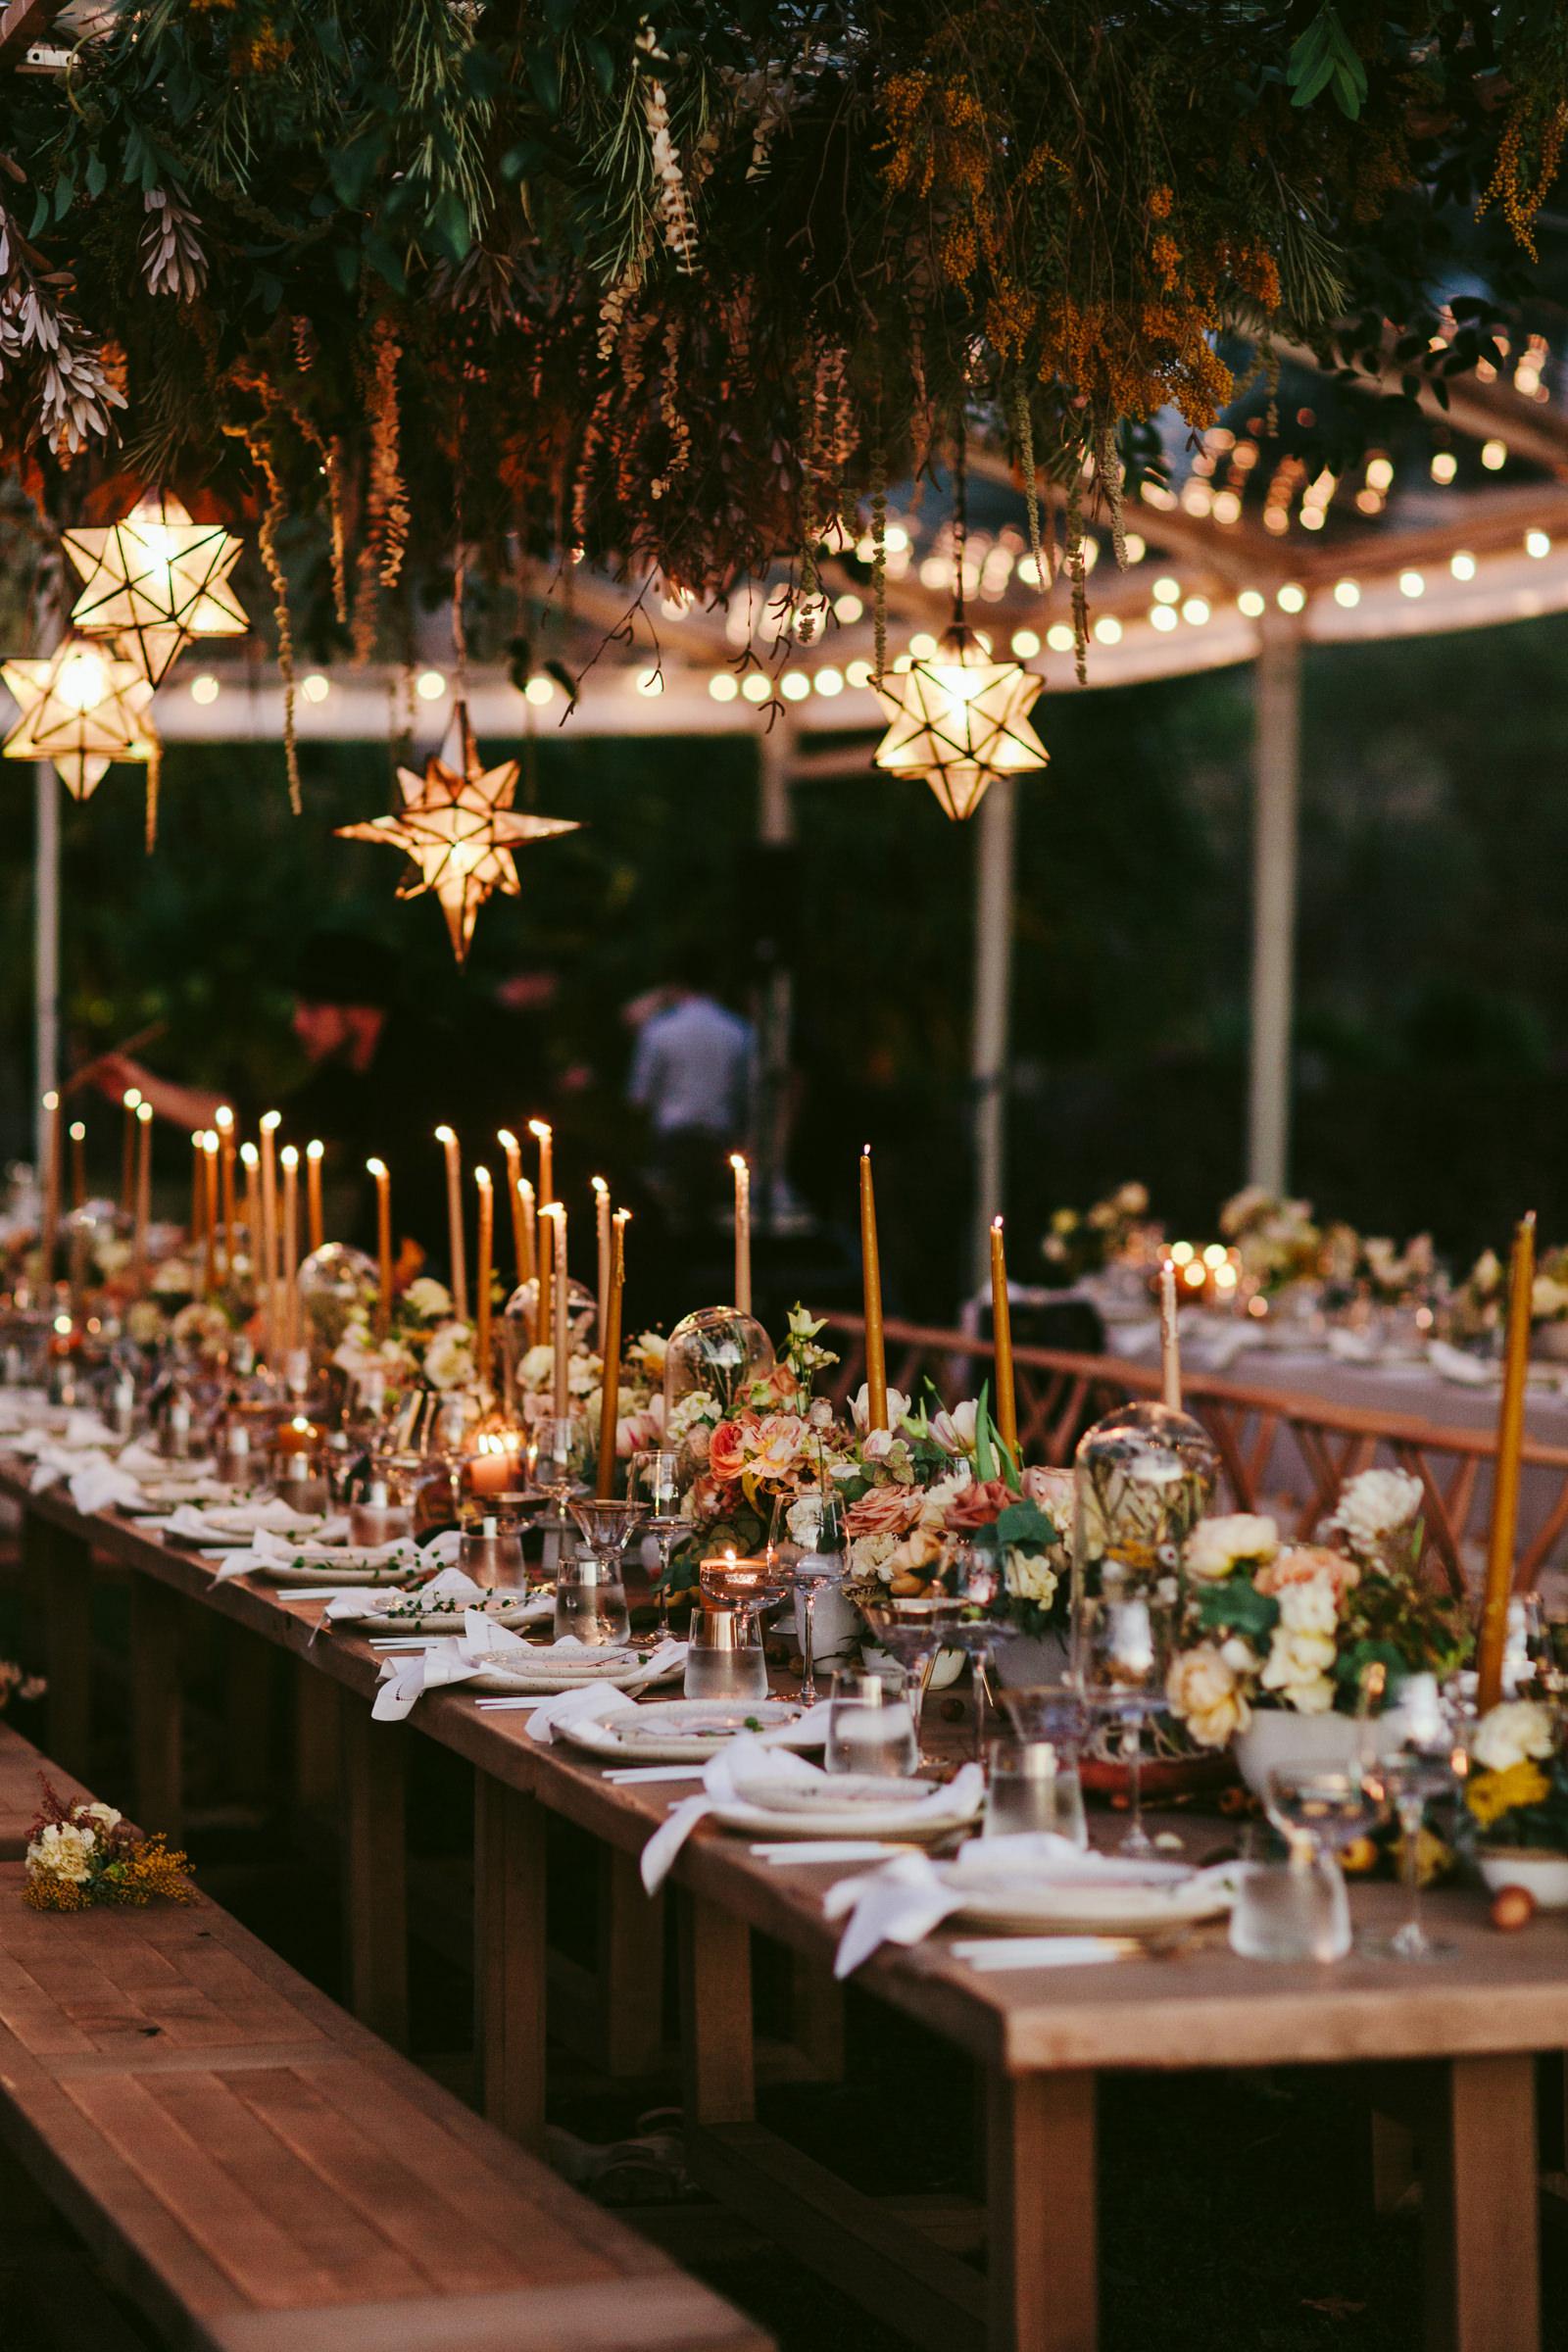 Hotel Wailea maui reception table - photo by Melia Lucida